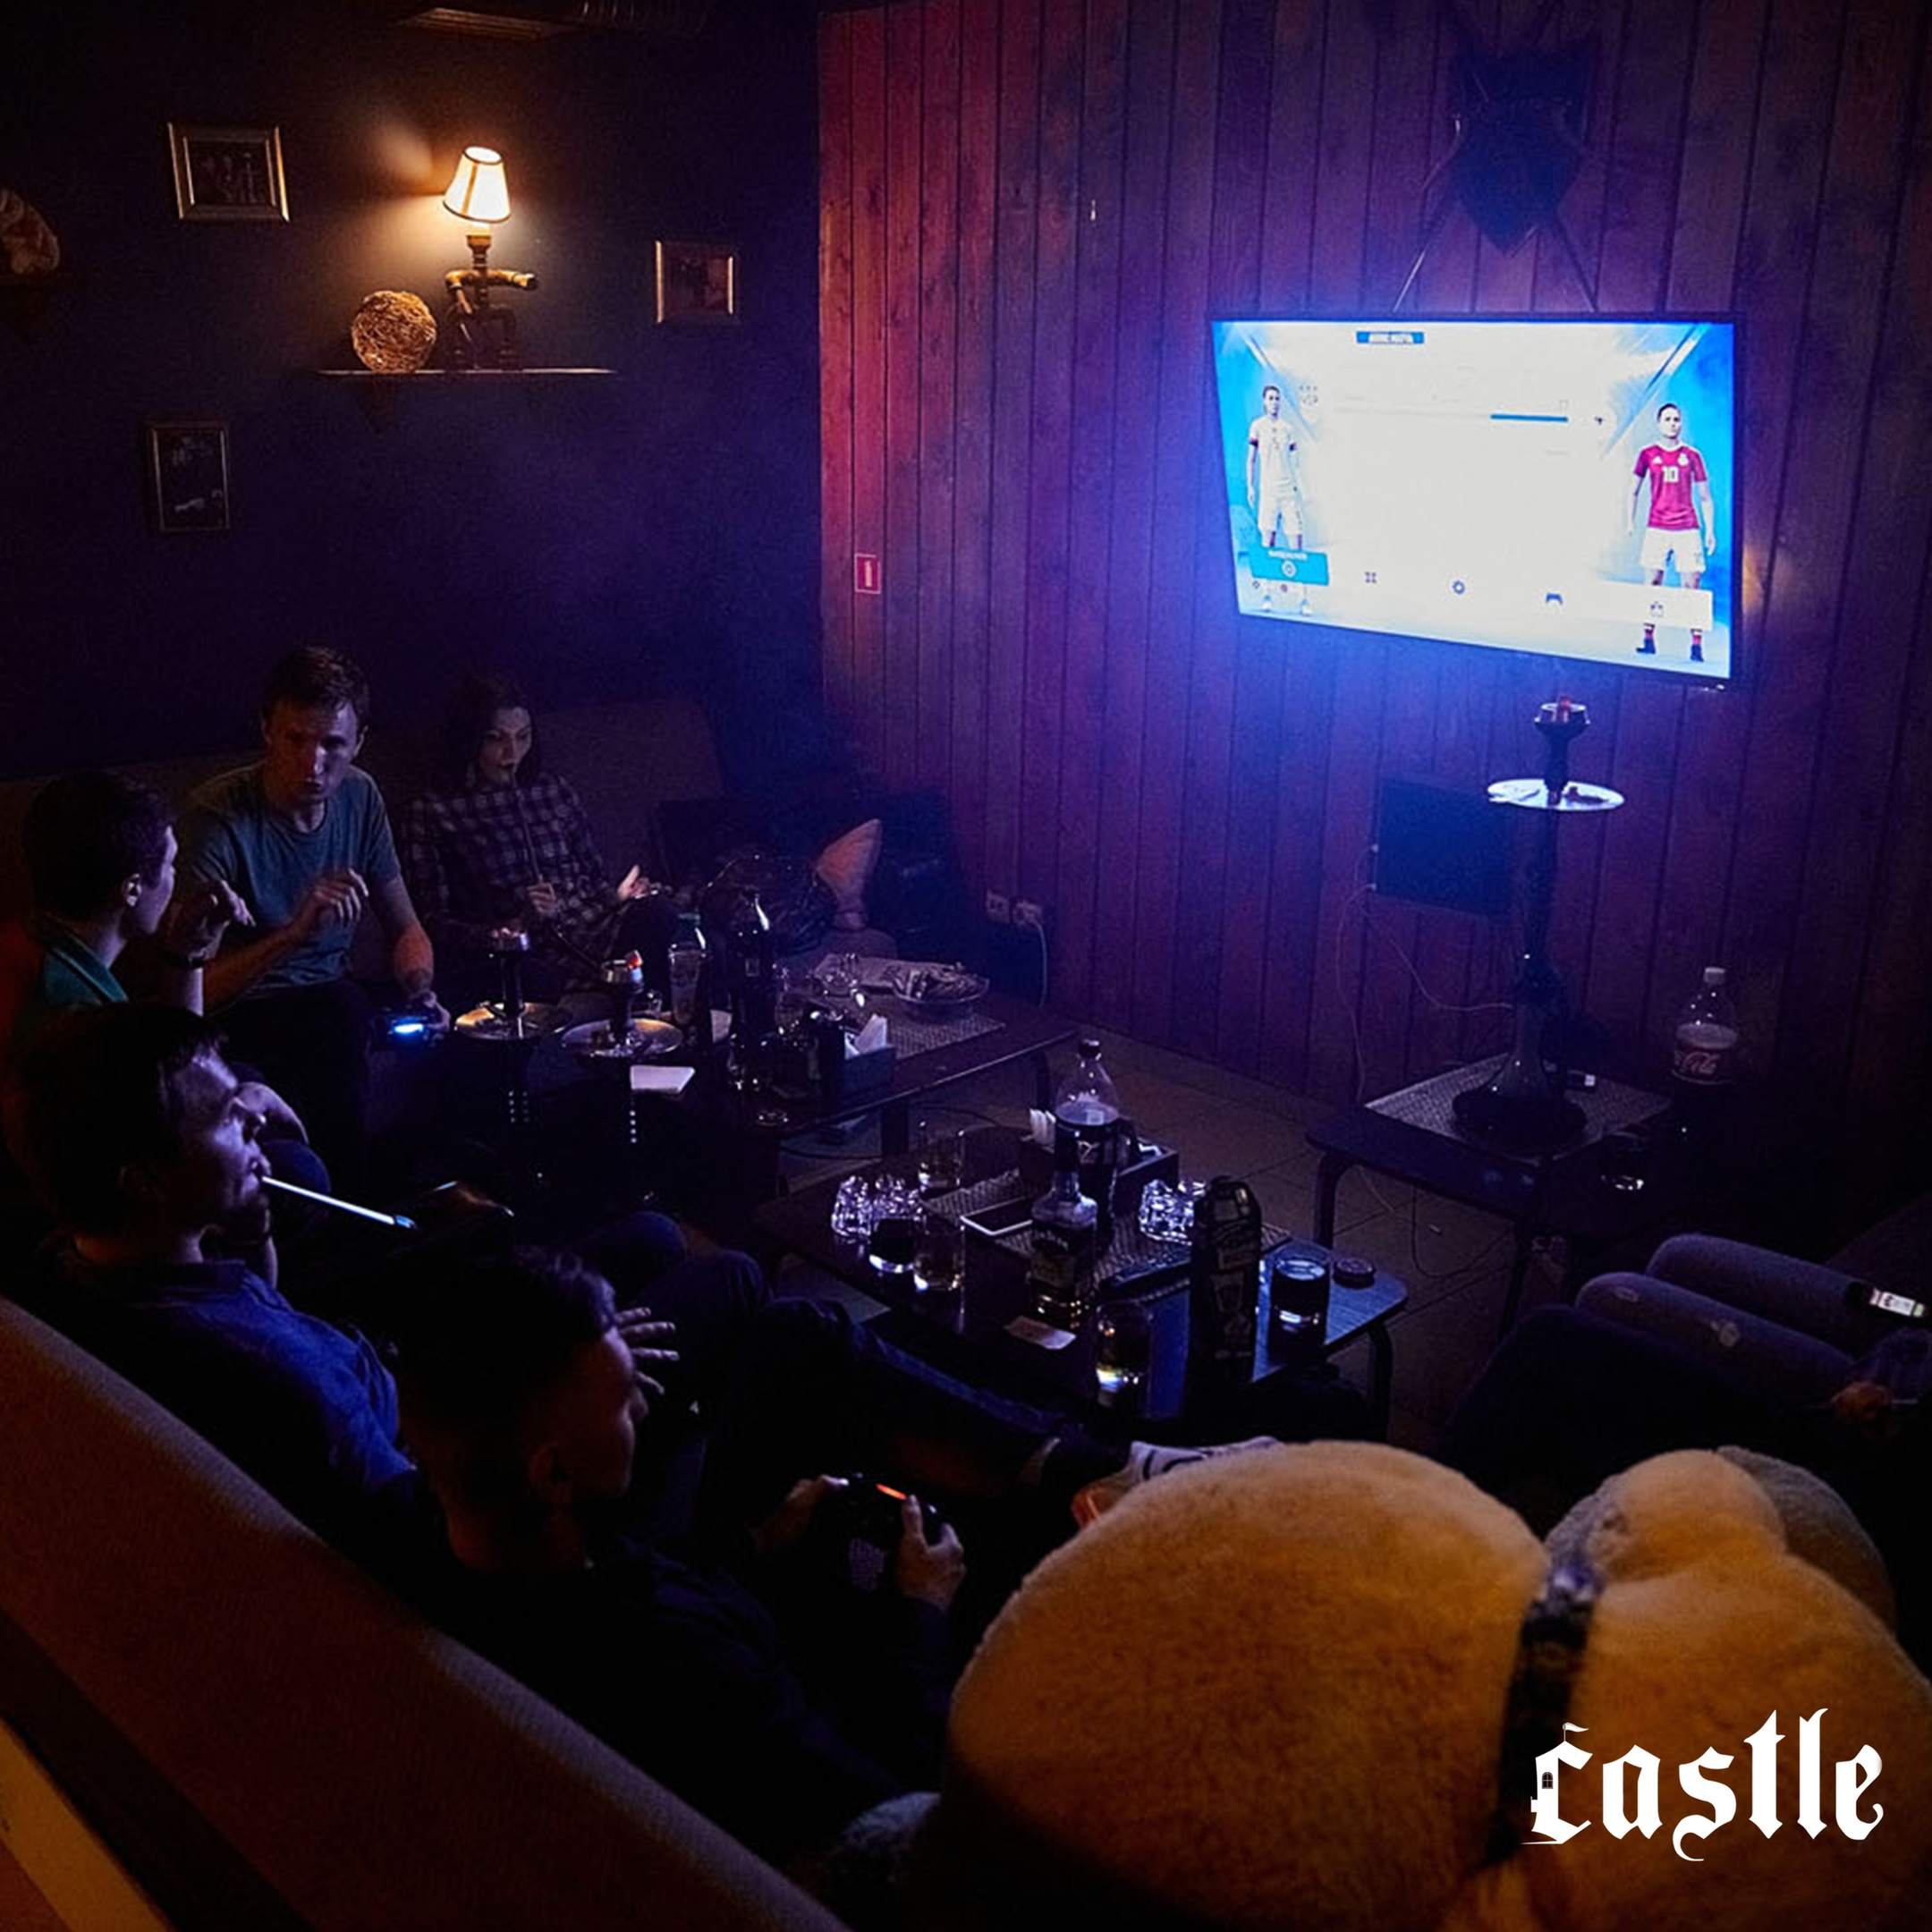 Кальянная, антикафе, бар «Castle» - Вконтакте